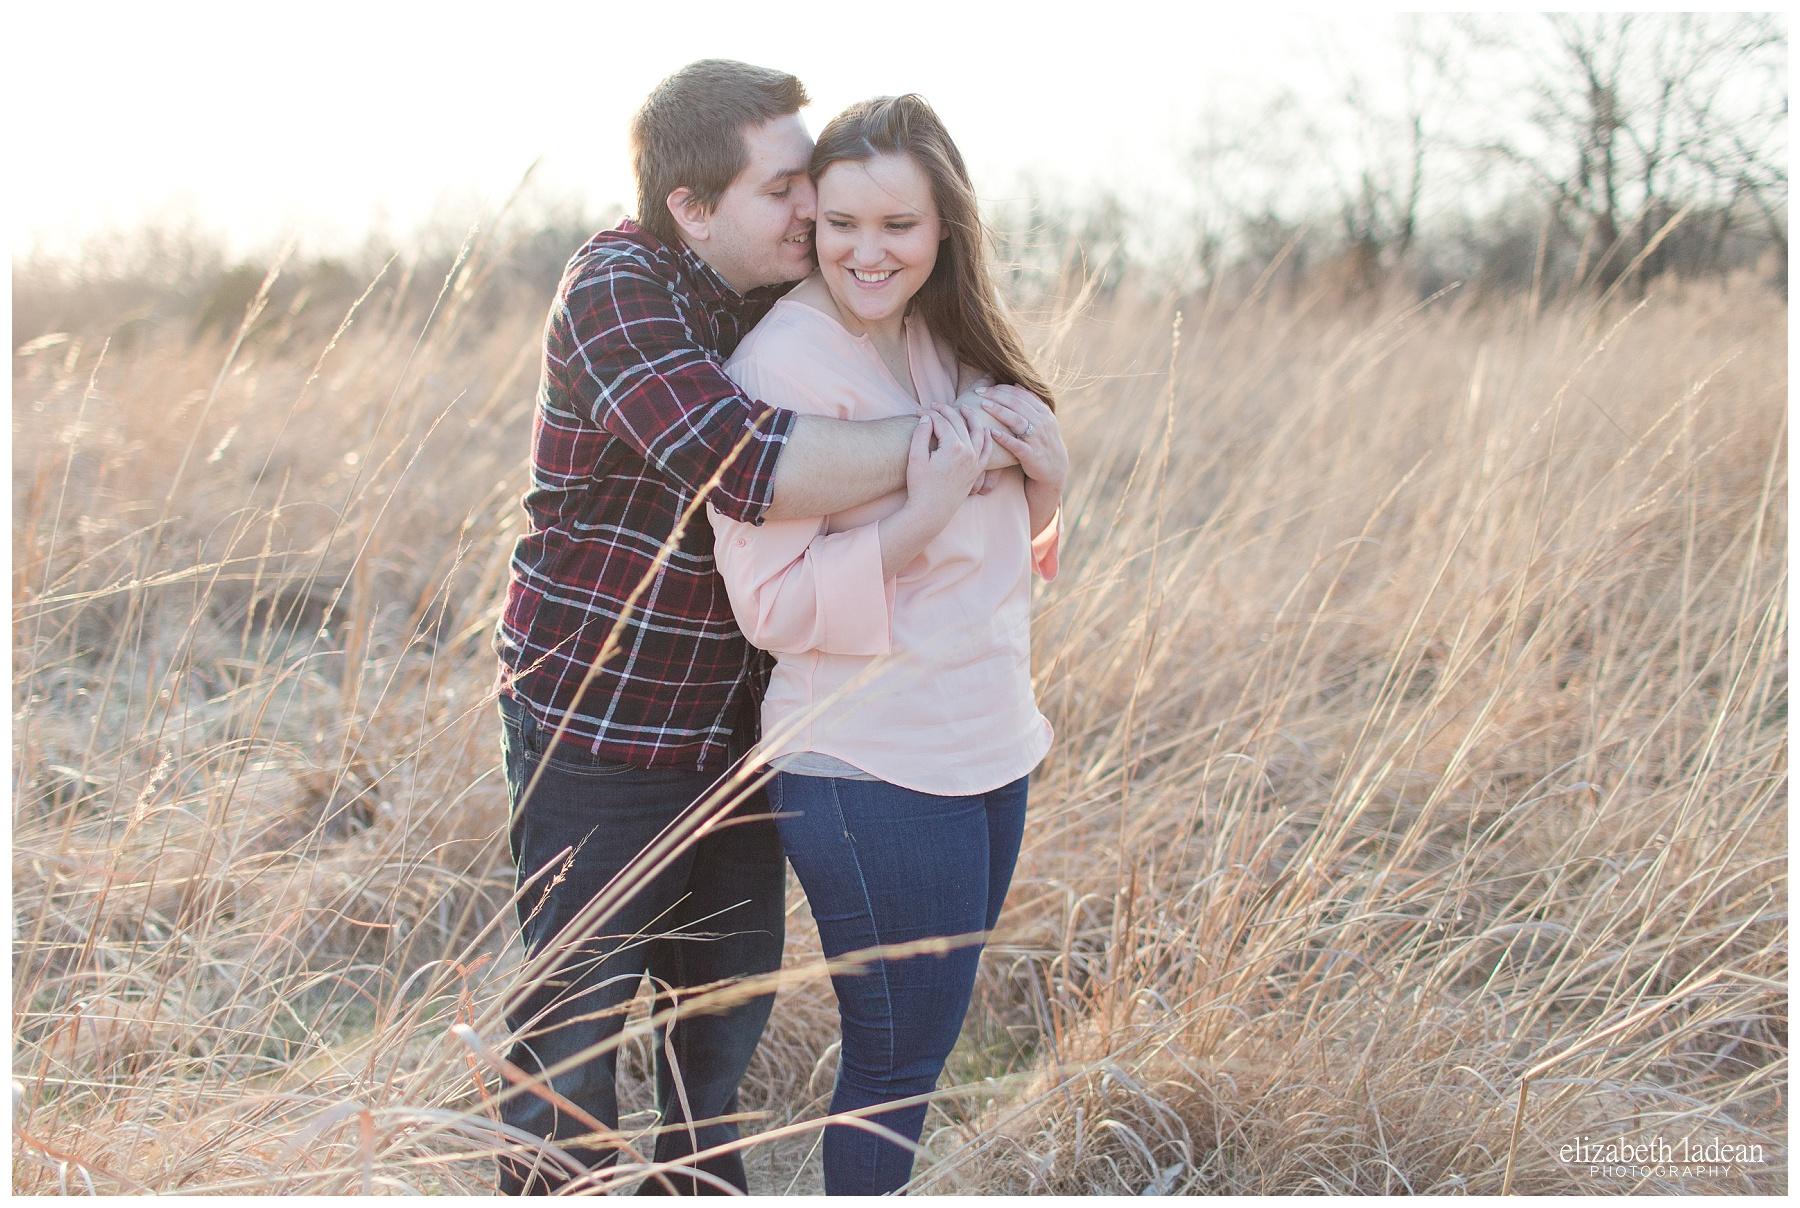 Burr-Oak-Woods-Engagement-Photos-Kansas City-S+J-2017-Elizabeth-Ladean-Photography-photo_0497.jpg